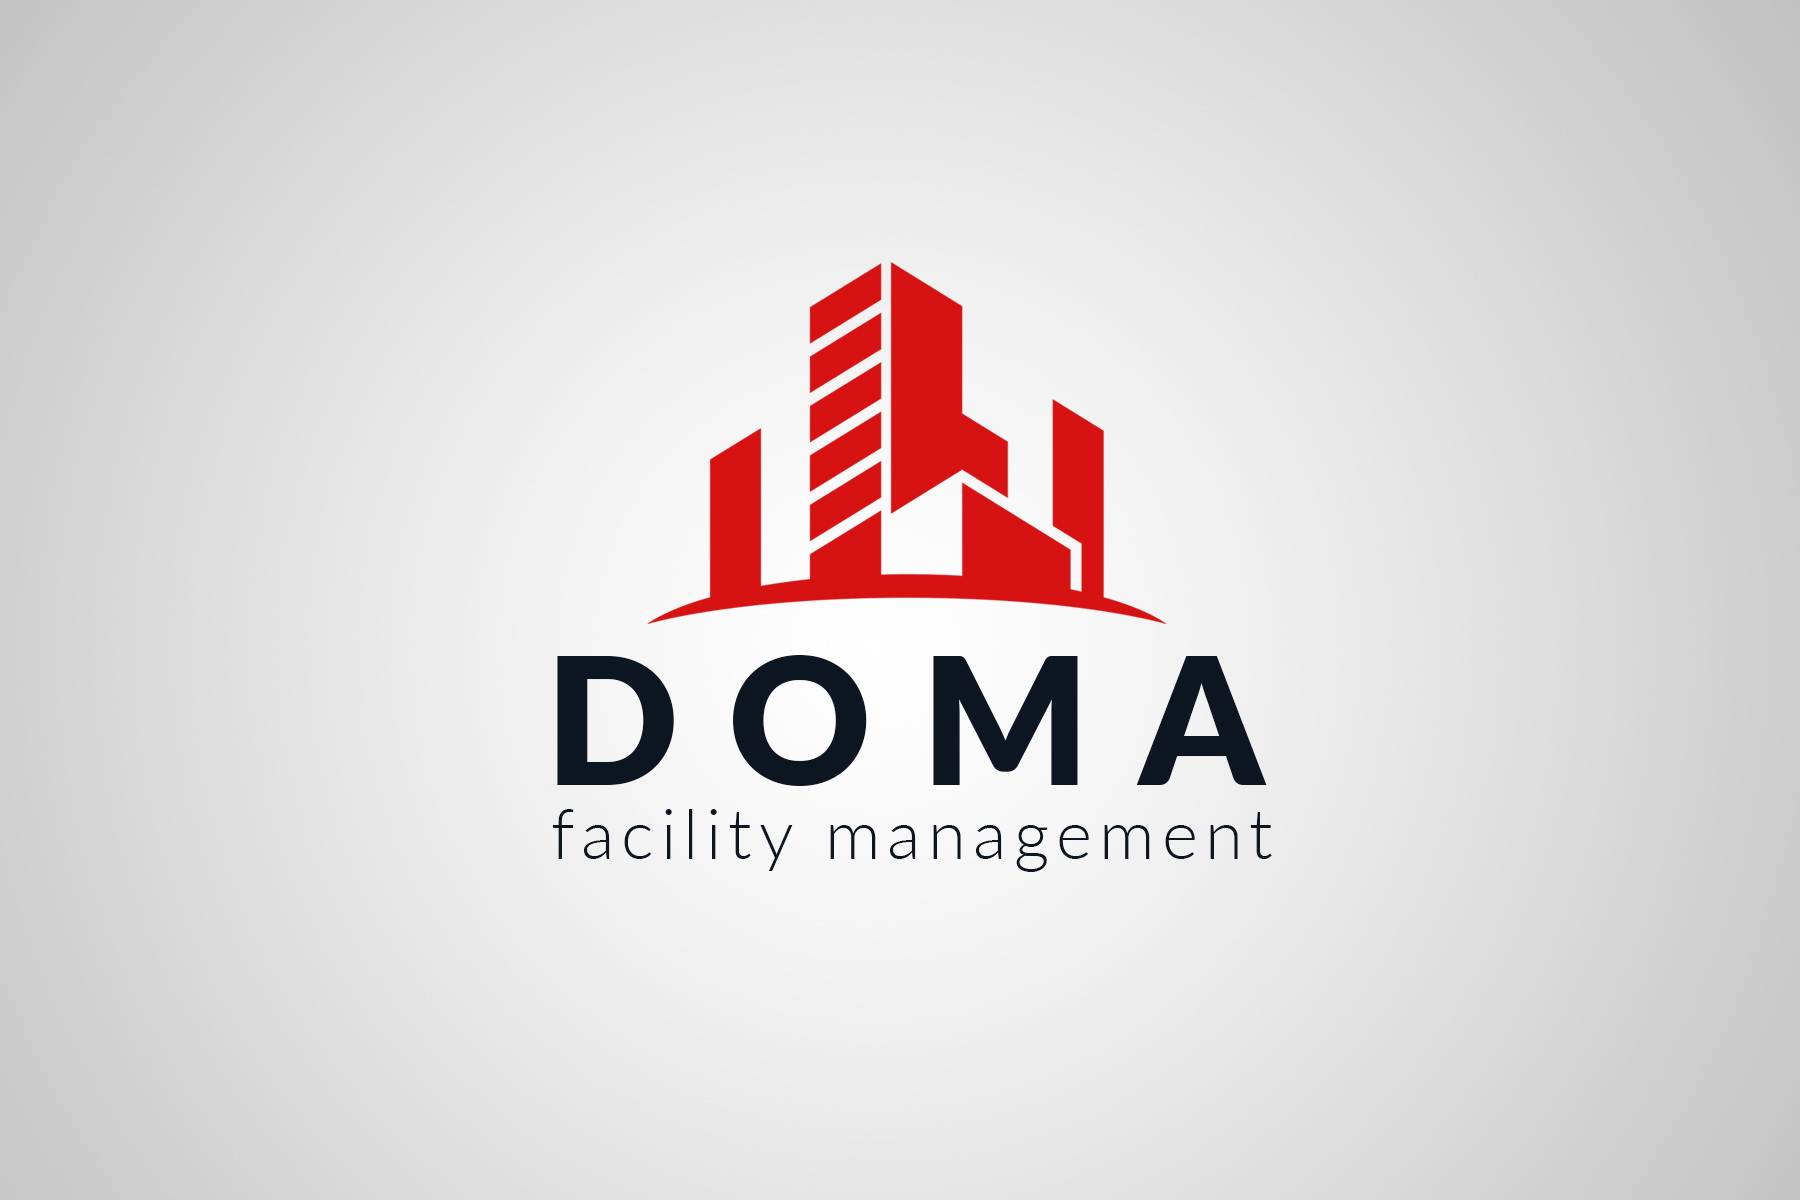 DOMA Facility Management